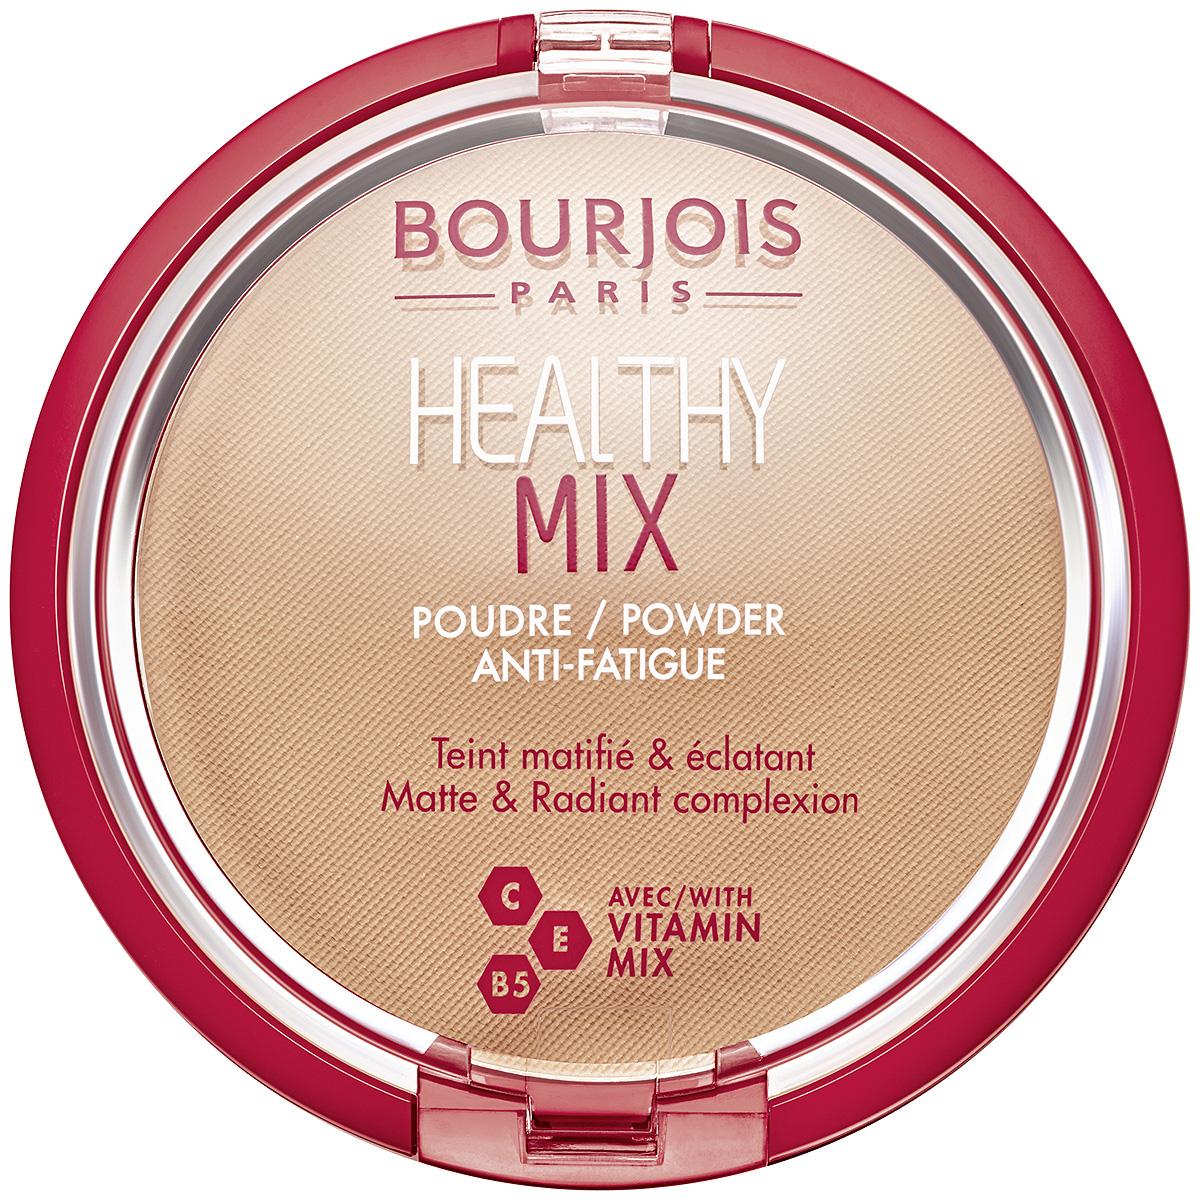 Bourjois Пудра Healthy Mix Тон №4, 11 г bourjois пудра healthy mix 11 г 4 тона 11 г тон 03